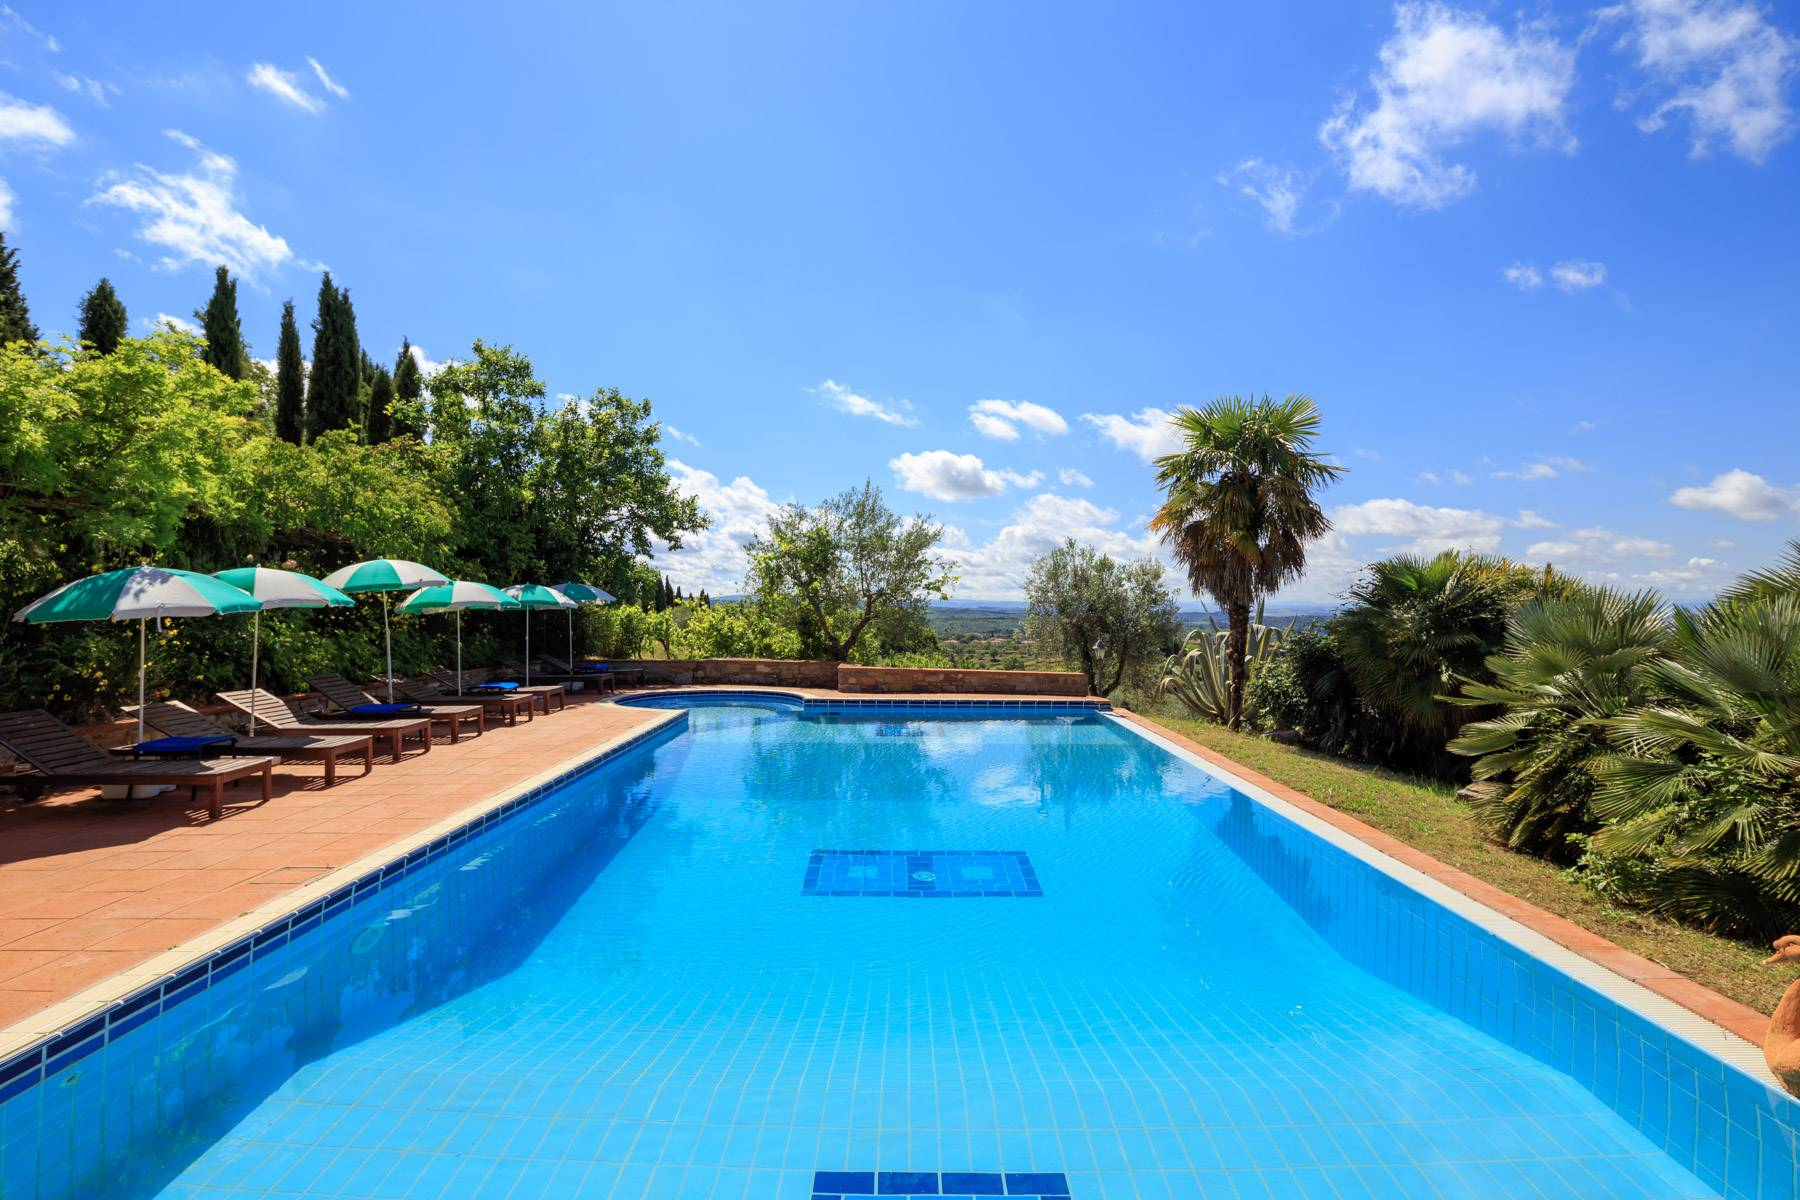 Villa in Vendita a Gaiole In Chianti: 5 locali, 465 mq